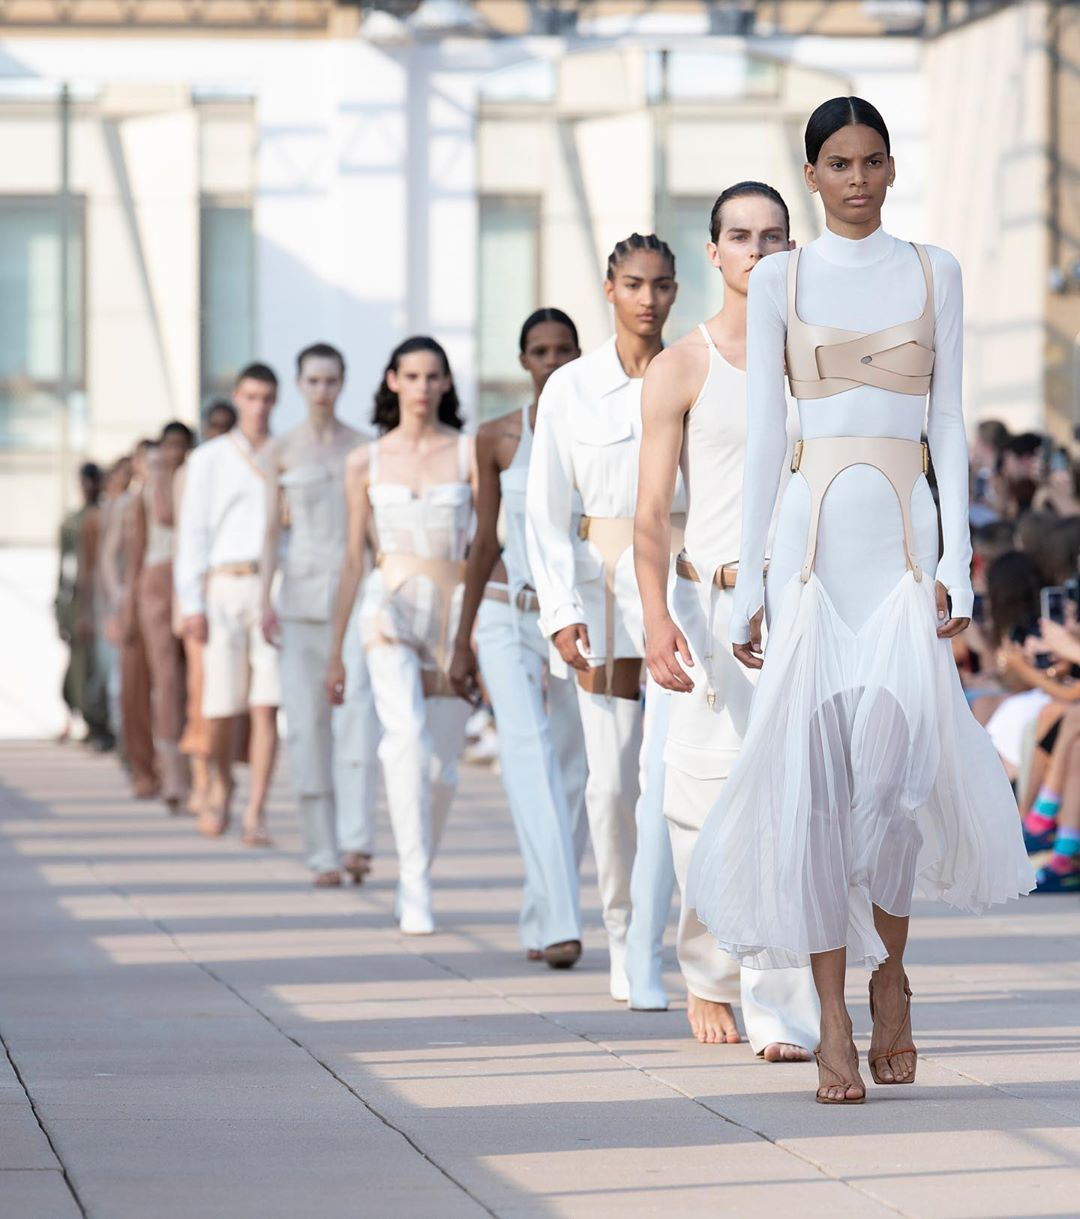 Фото: Неделя моды в Нью-Йорке: Dion Lee весна-лето 2020